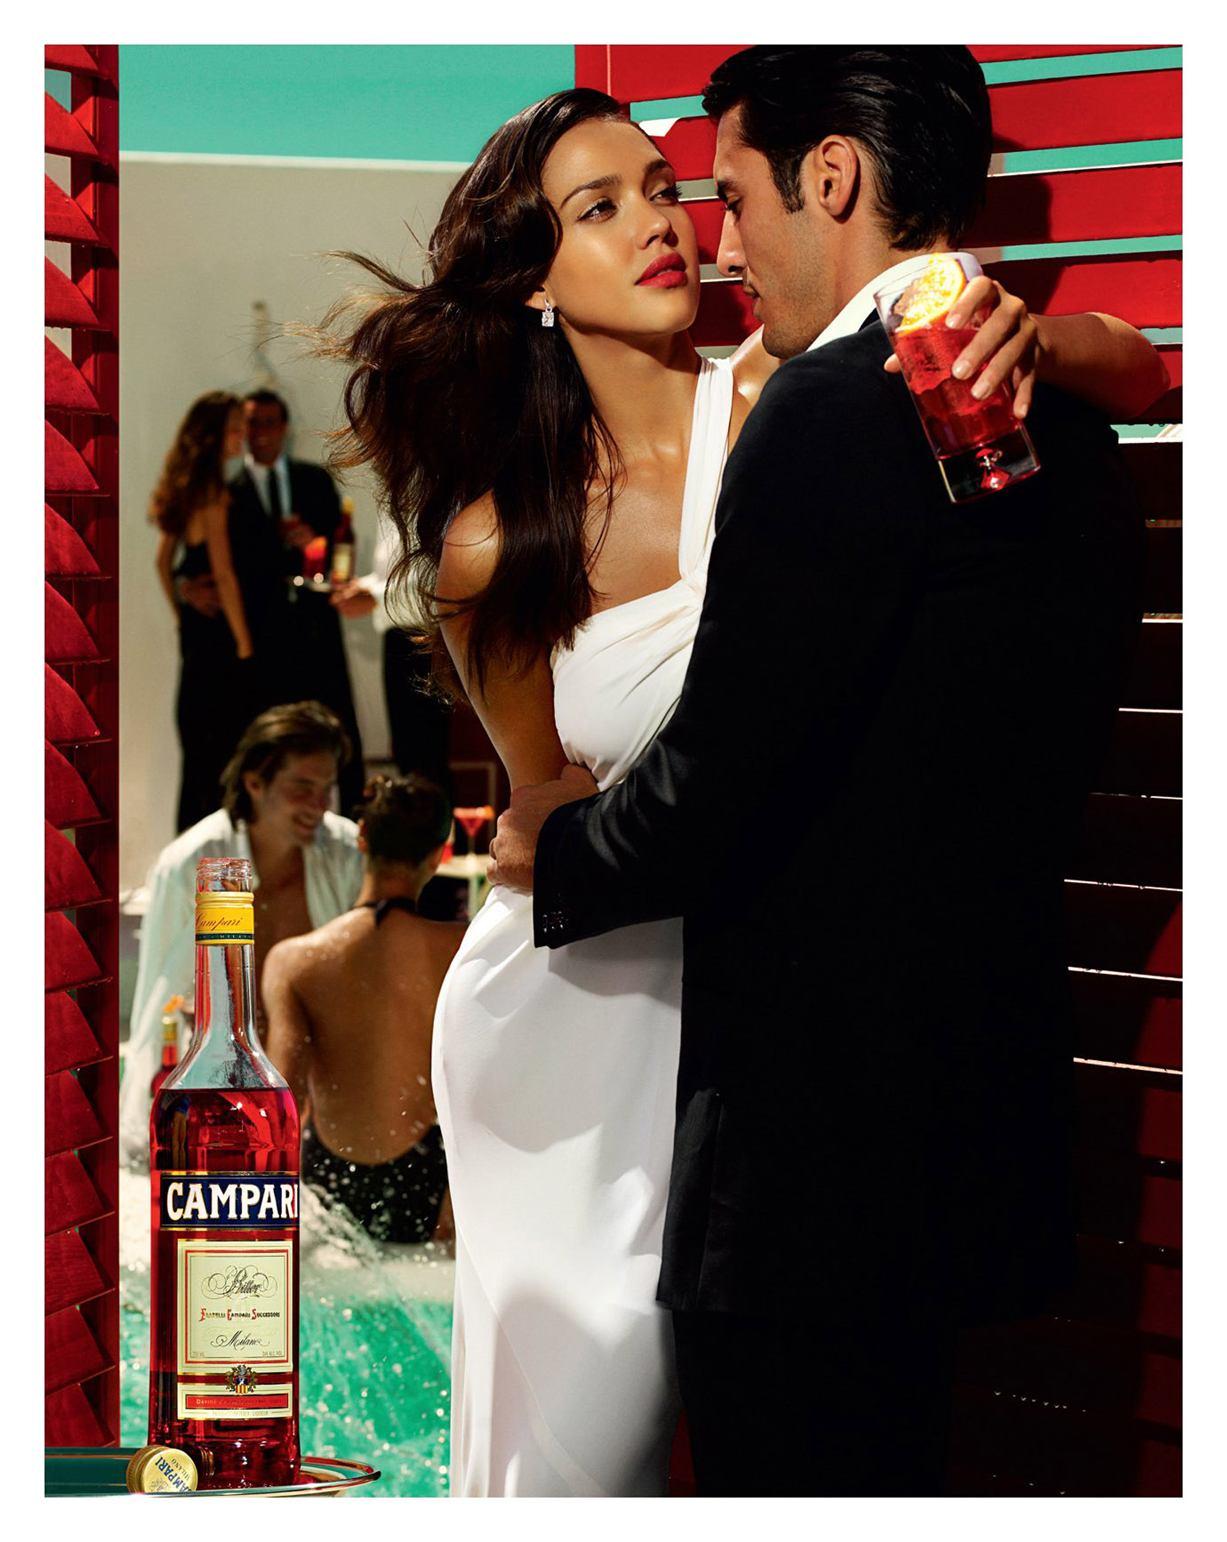 Jessica Alba / Джессика Альба на календаре Campari 2009